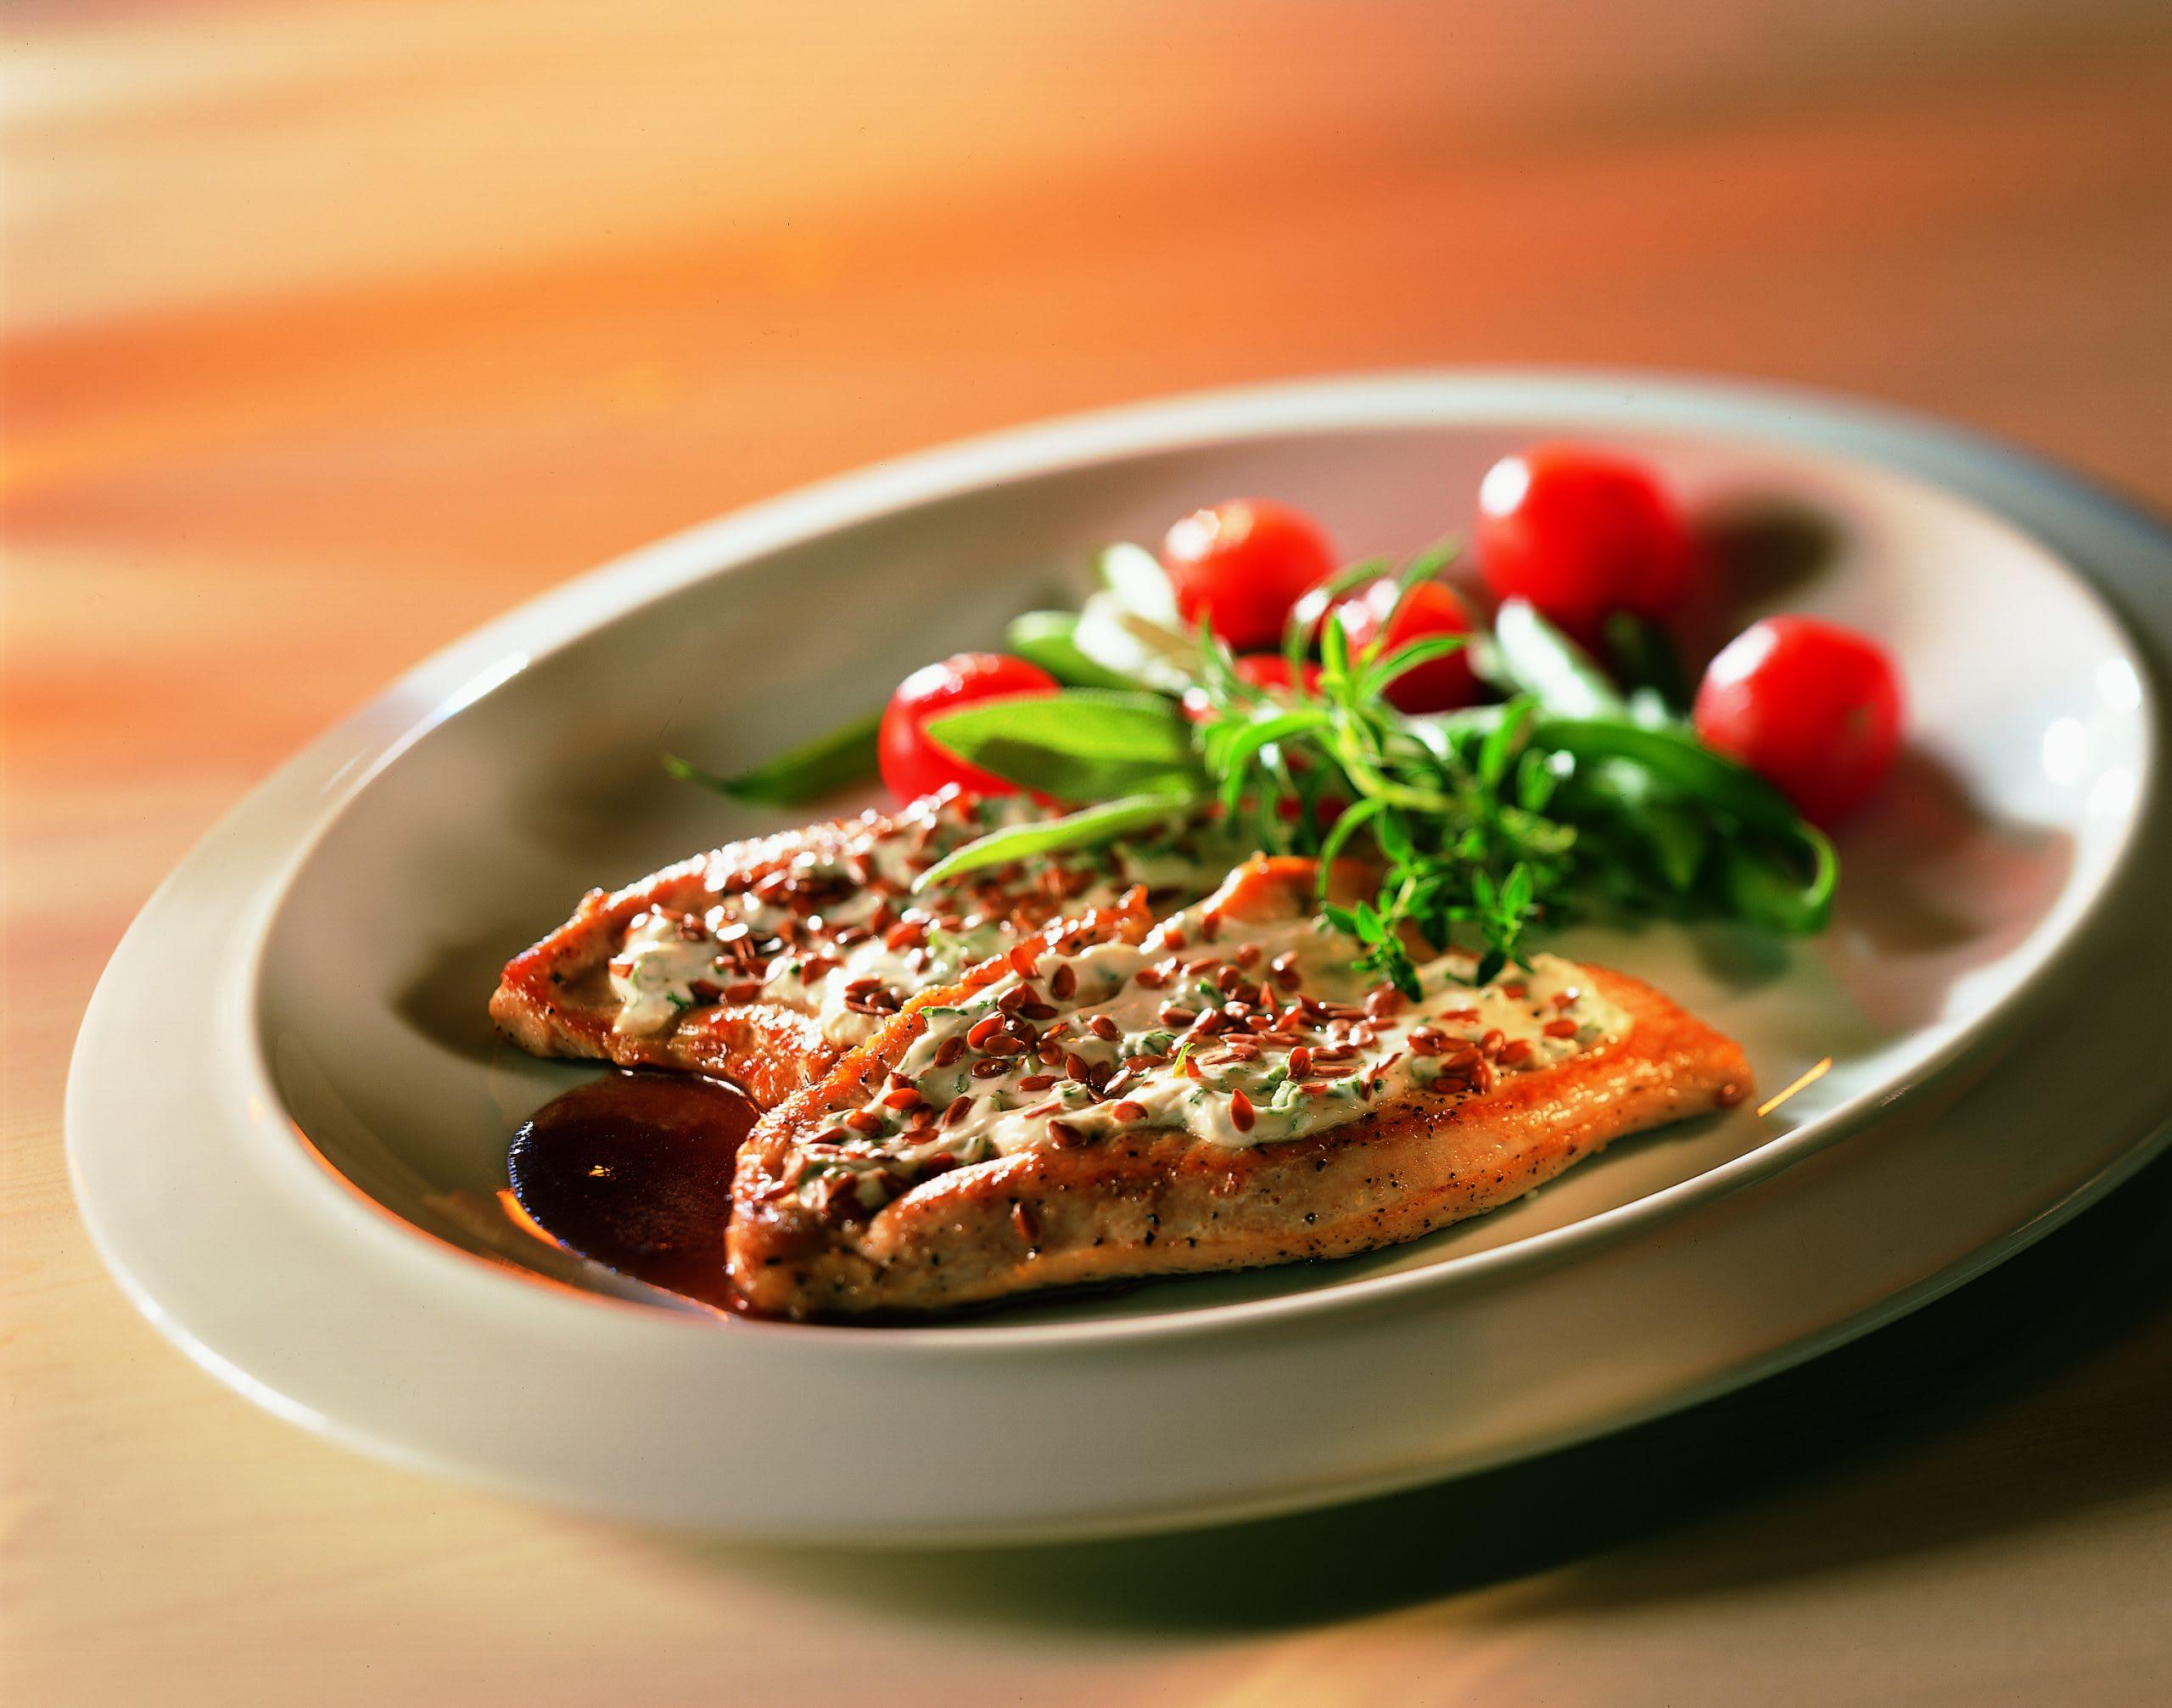 Kleine Truthahnschnitzel an Rotweinsauce